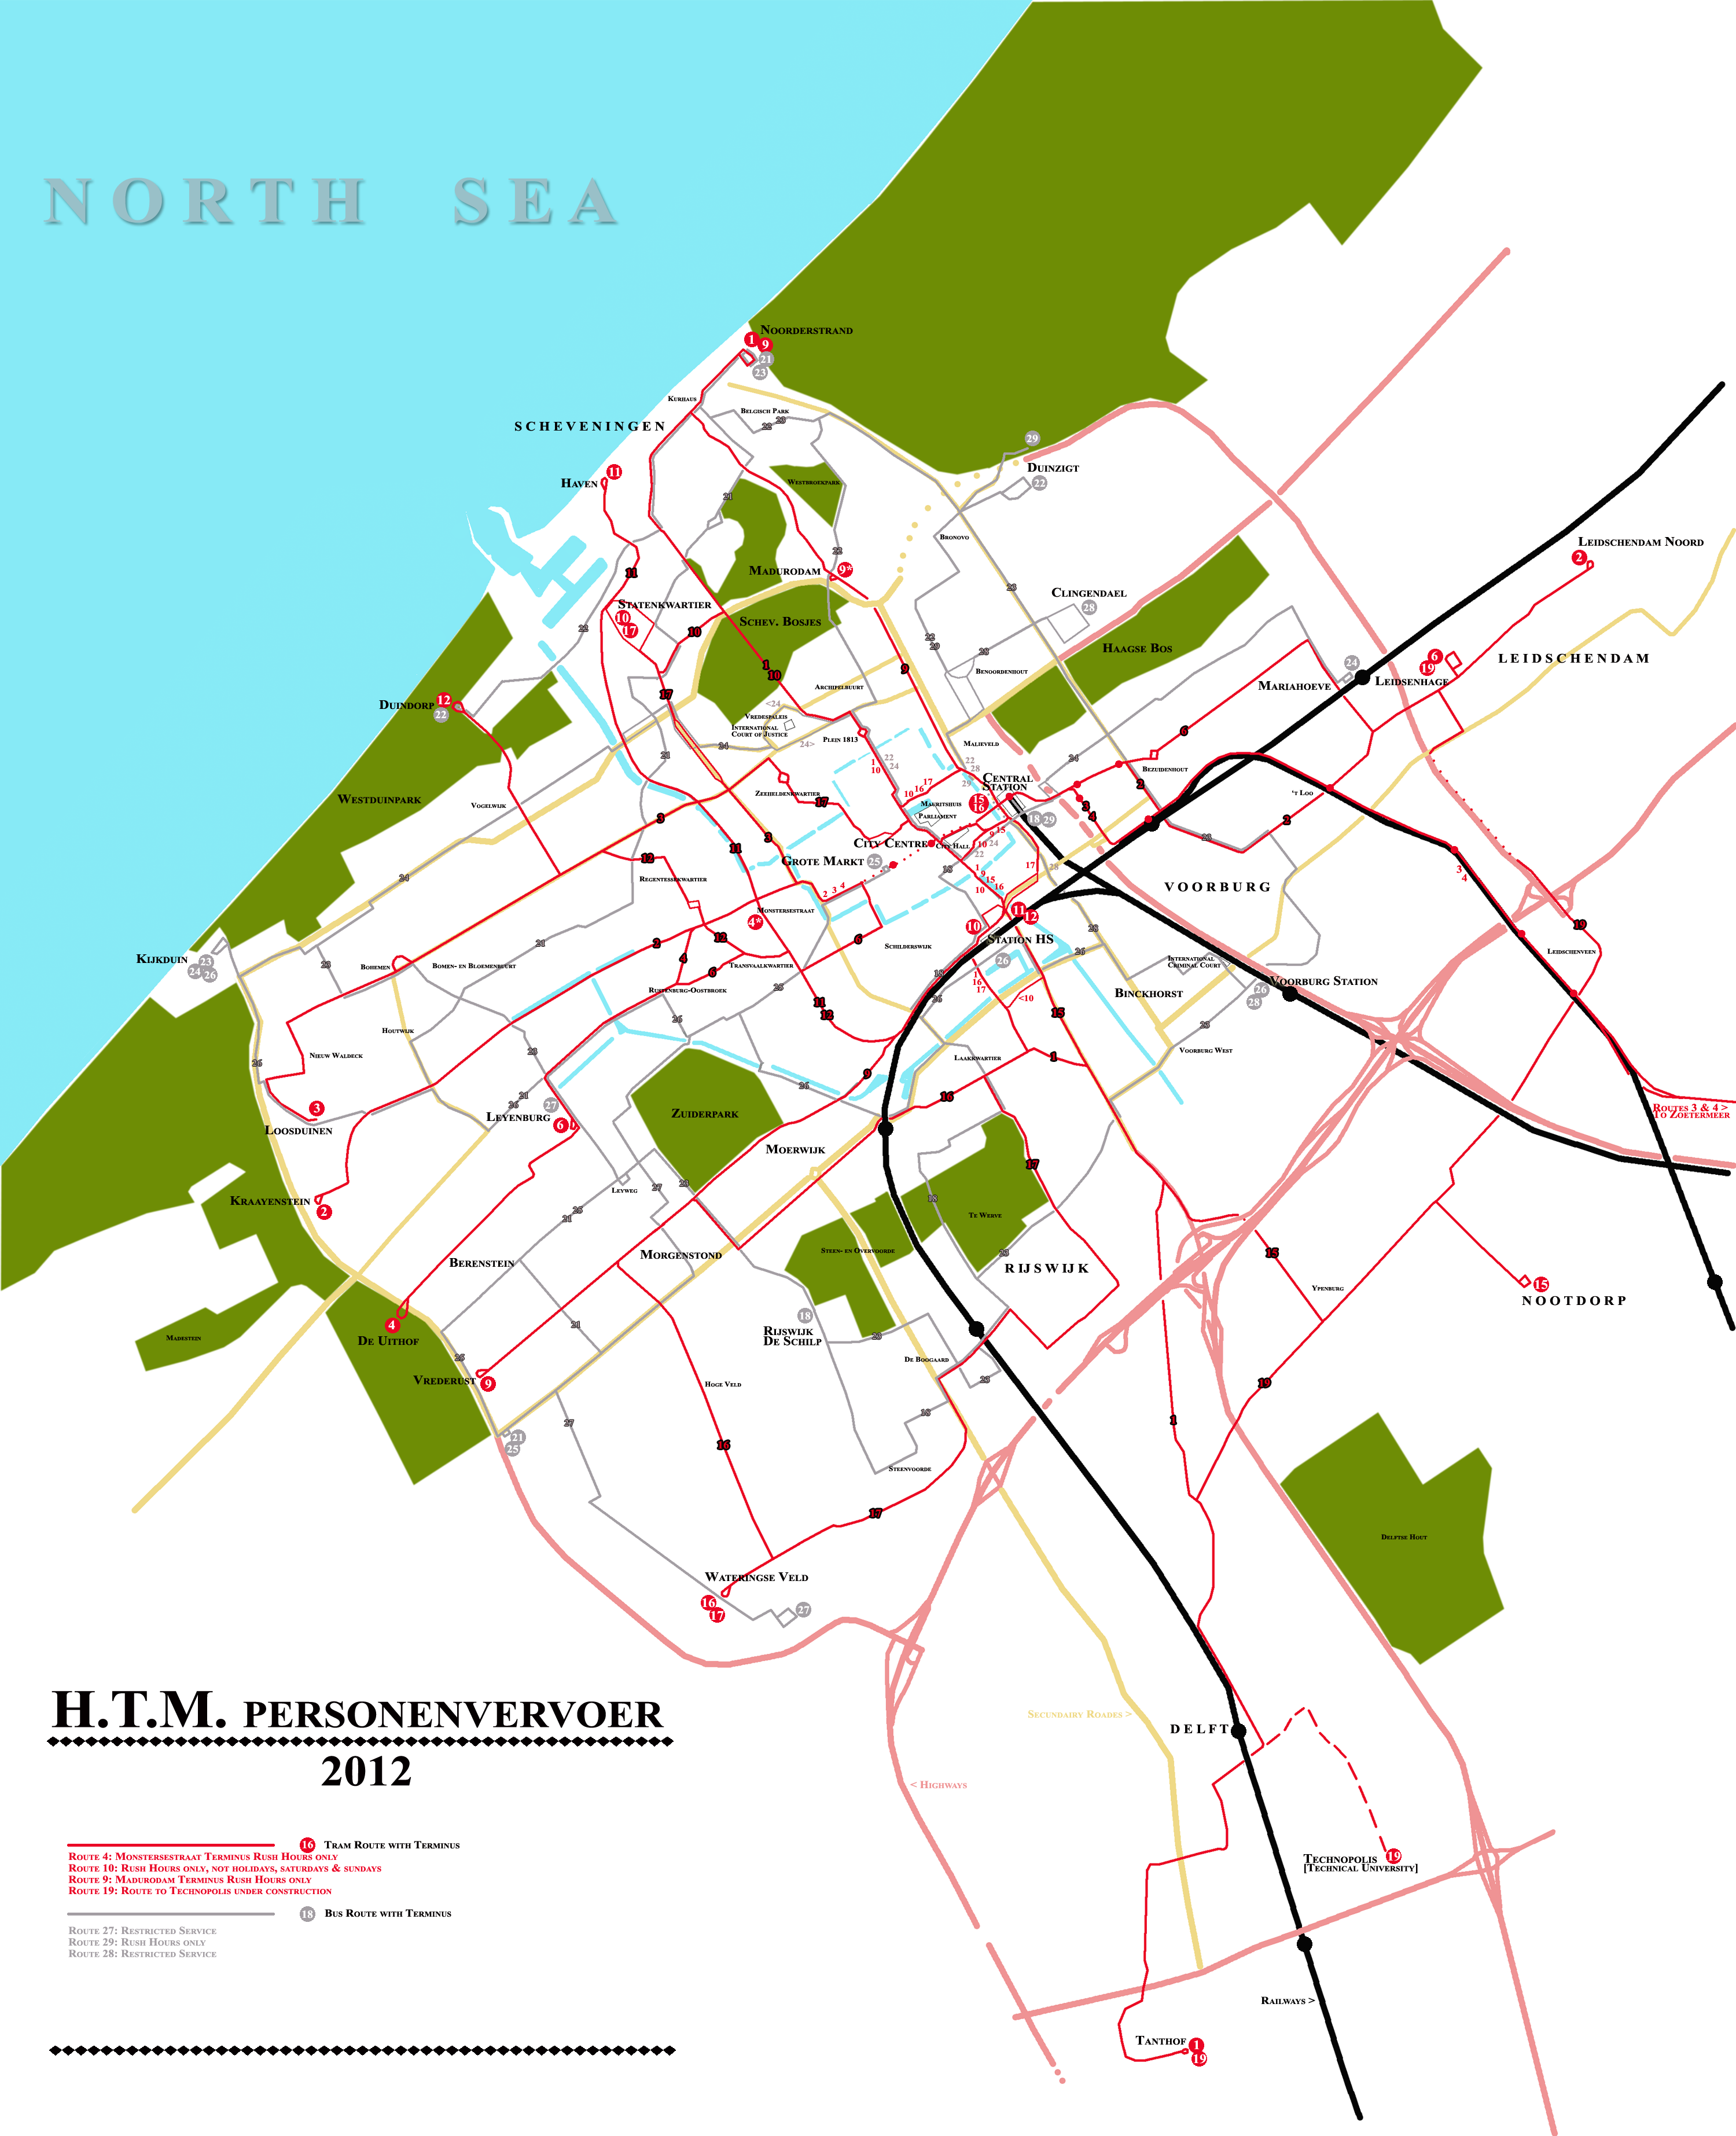 FileHTM Personenvervoer The Hague 2012png Wikimedia Commons